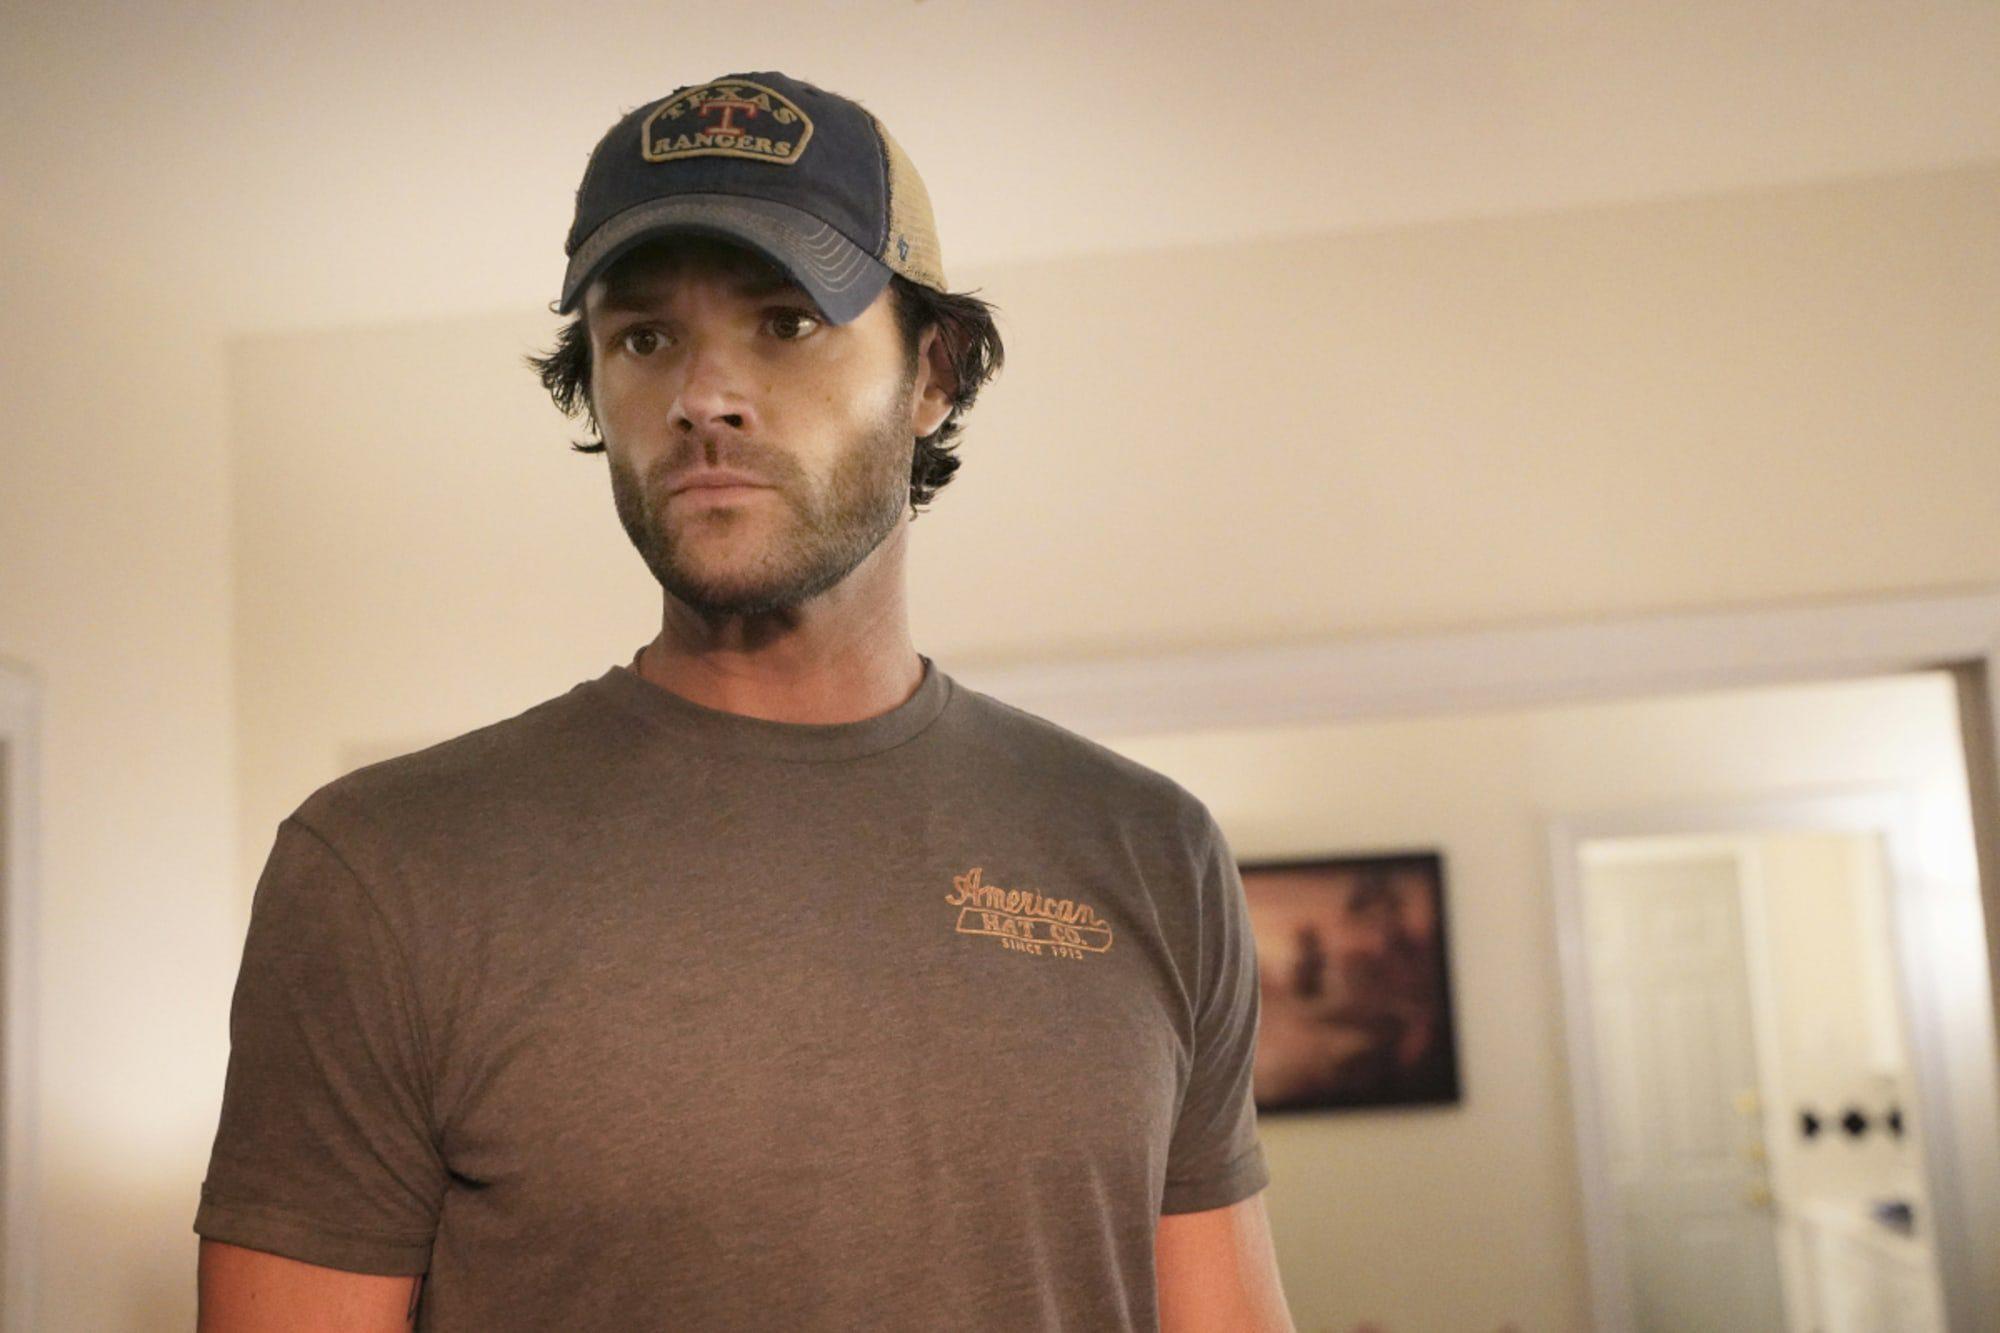 Walker Season 1 Episode 17 Release Date and Spoilers